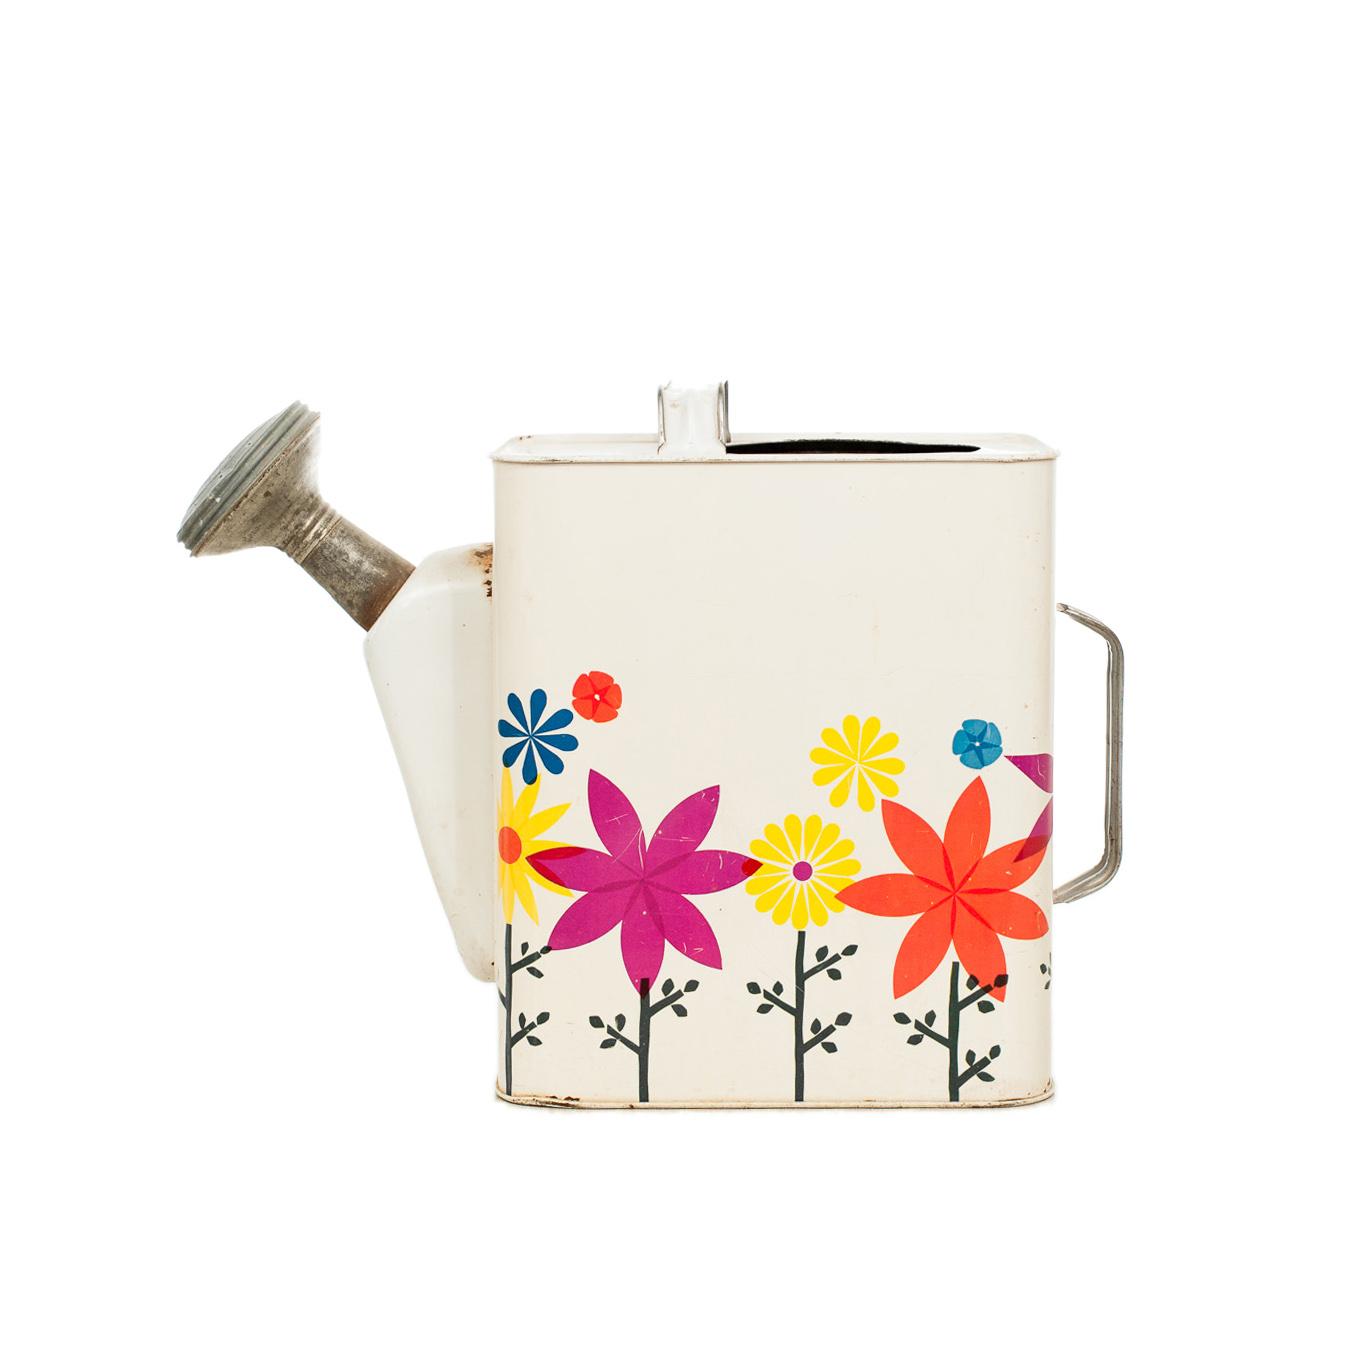 Han-D Flower Sprinkl Can